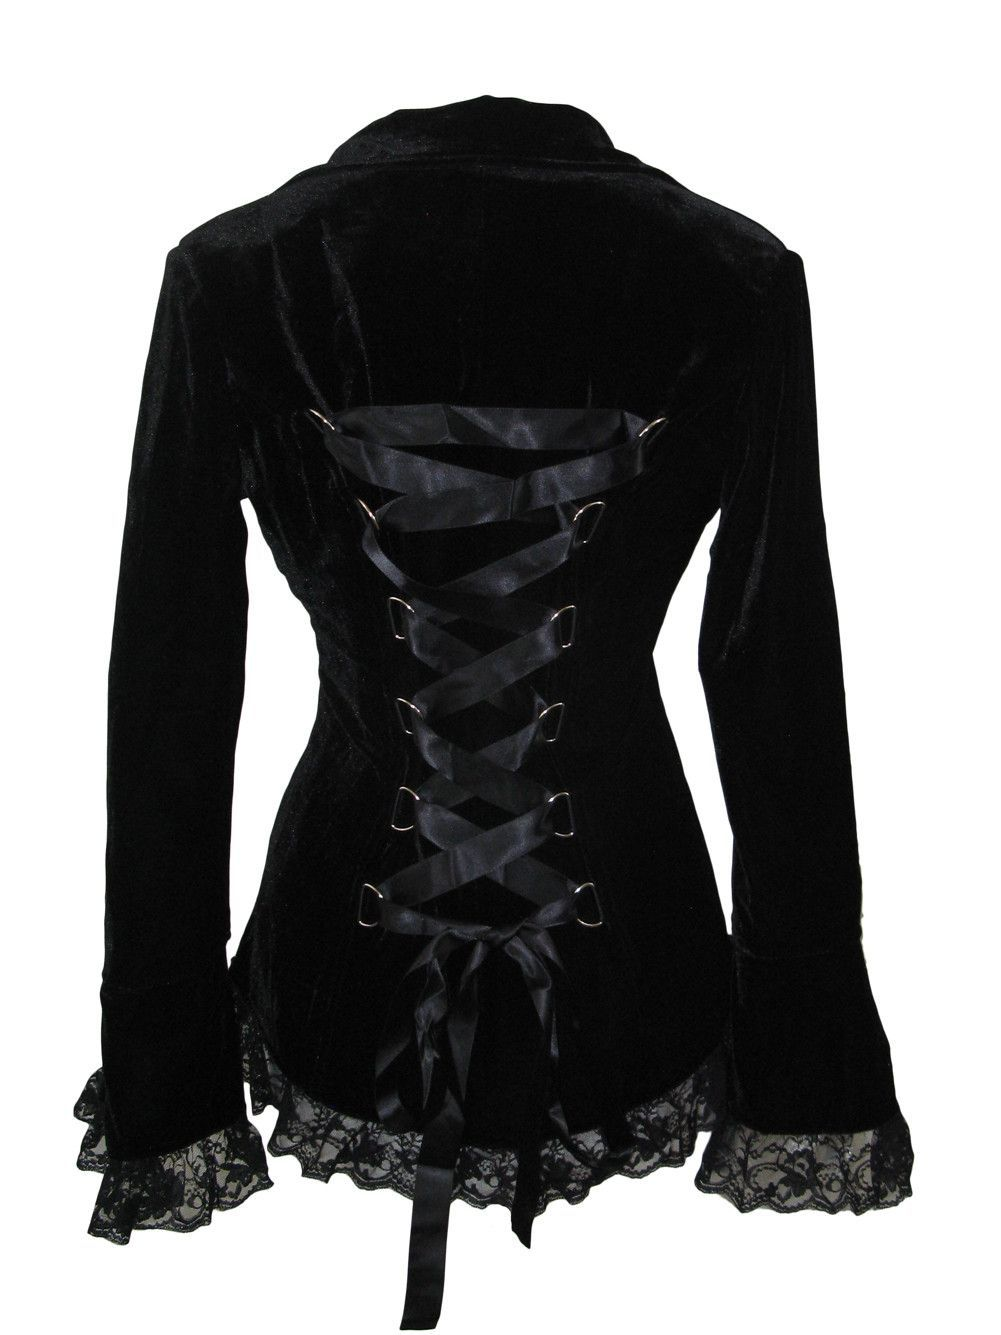 up Steampunk Corset Lace Victorian Gothic Velvet Black bYf7v6gmIy